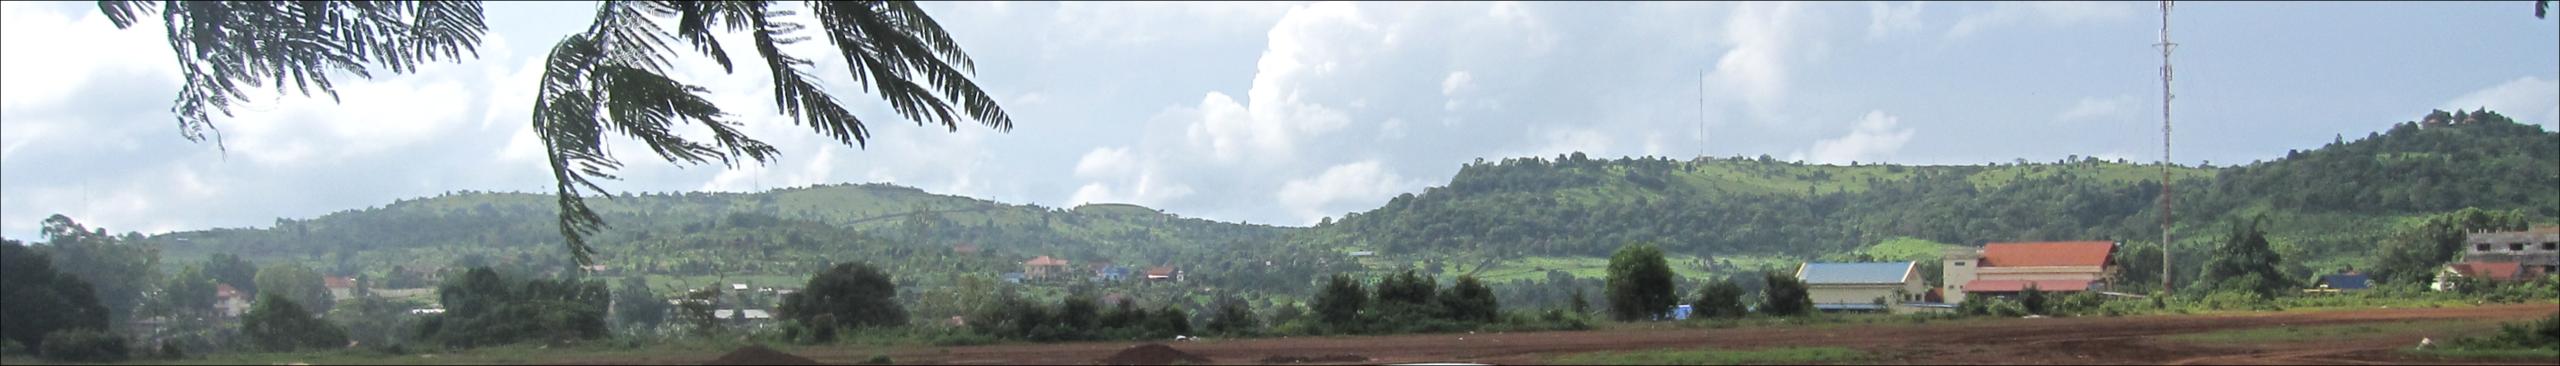 Sen Monorom Cambodia  city photo : Senmonorom – Travel guide at Wikivoyage